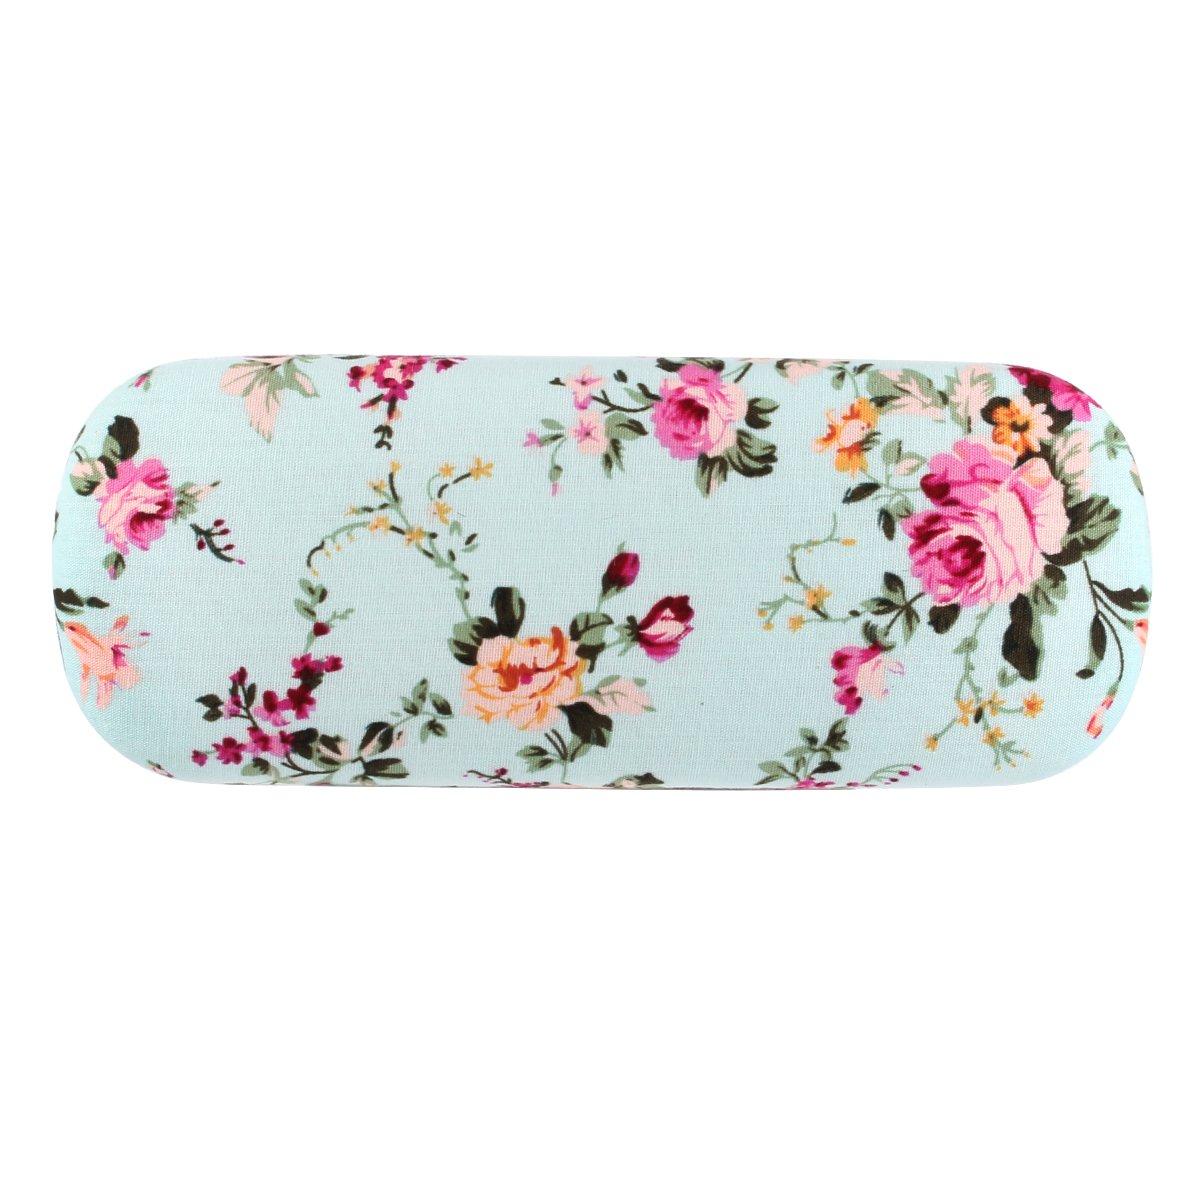 EZESO Fabrics Floral Retro Light Portable Eyeglasses Case (2 pcs blue+pink) by Ezeso (Image #5)